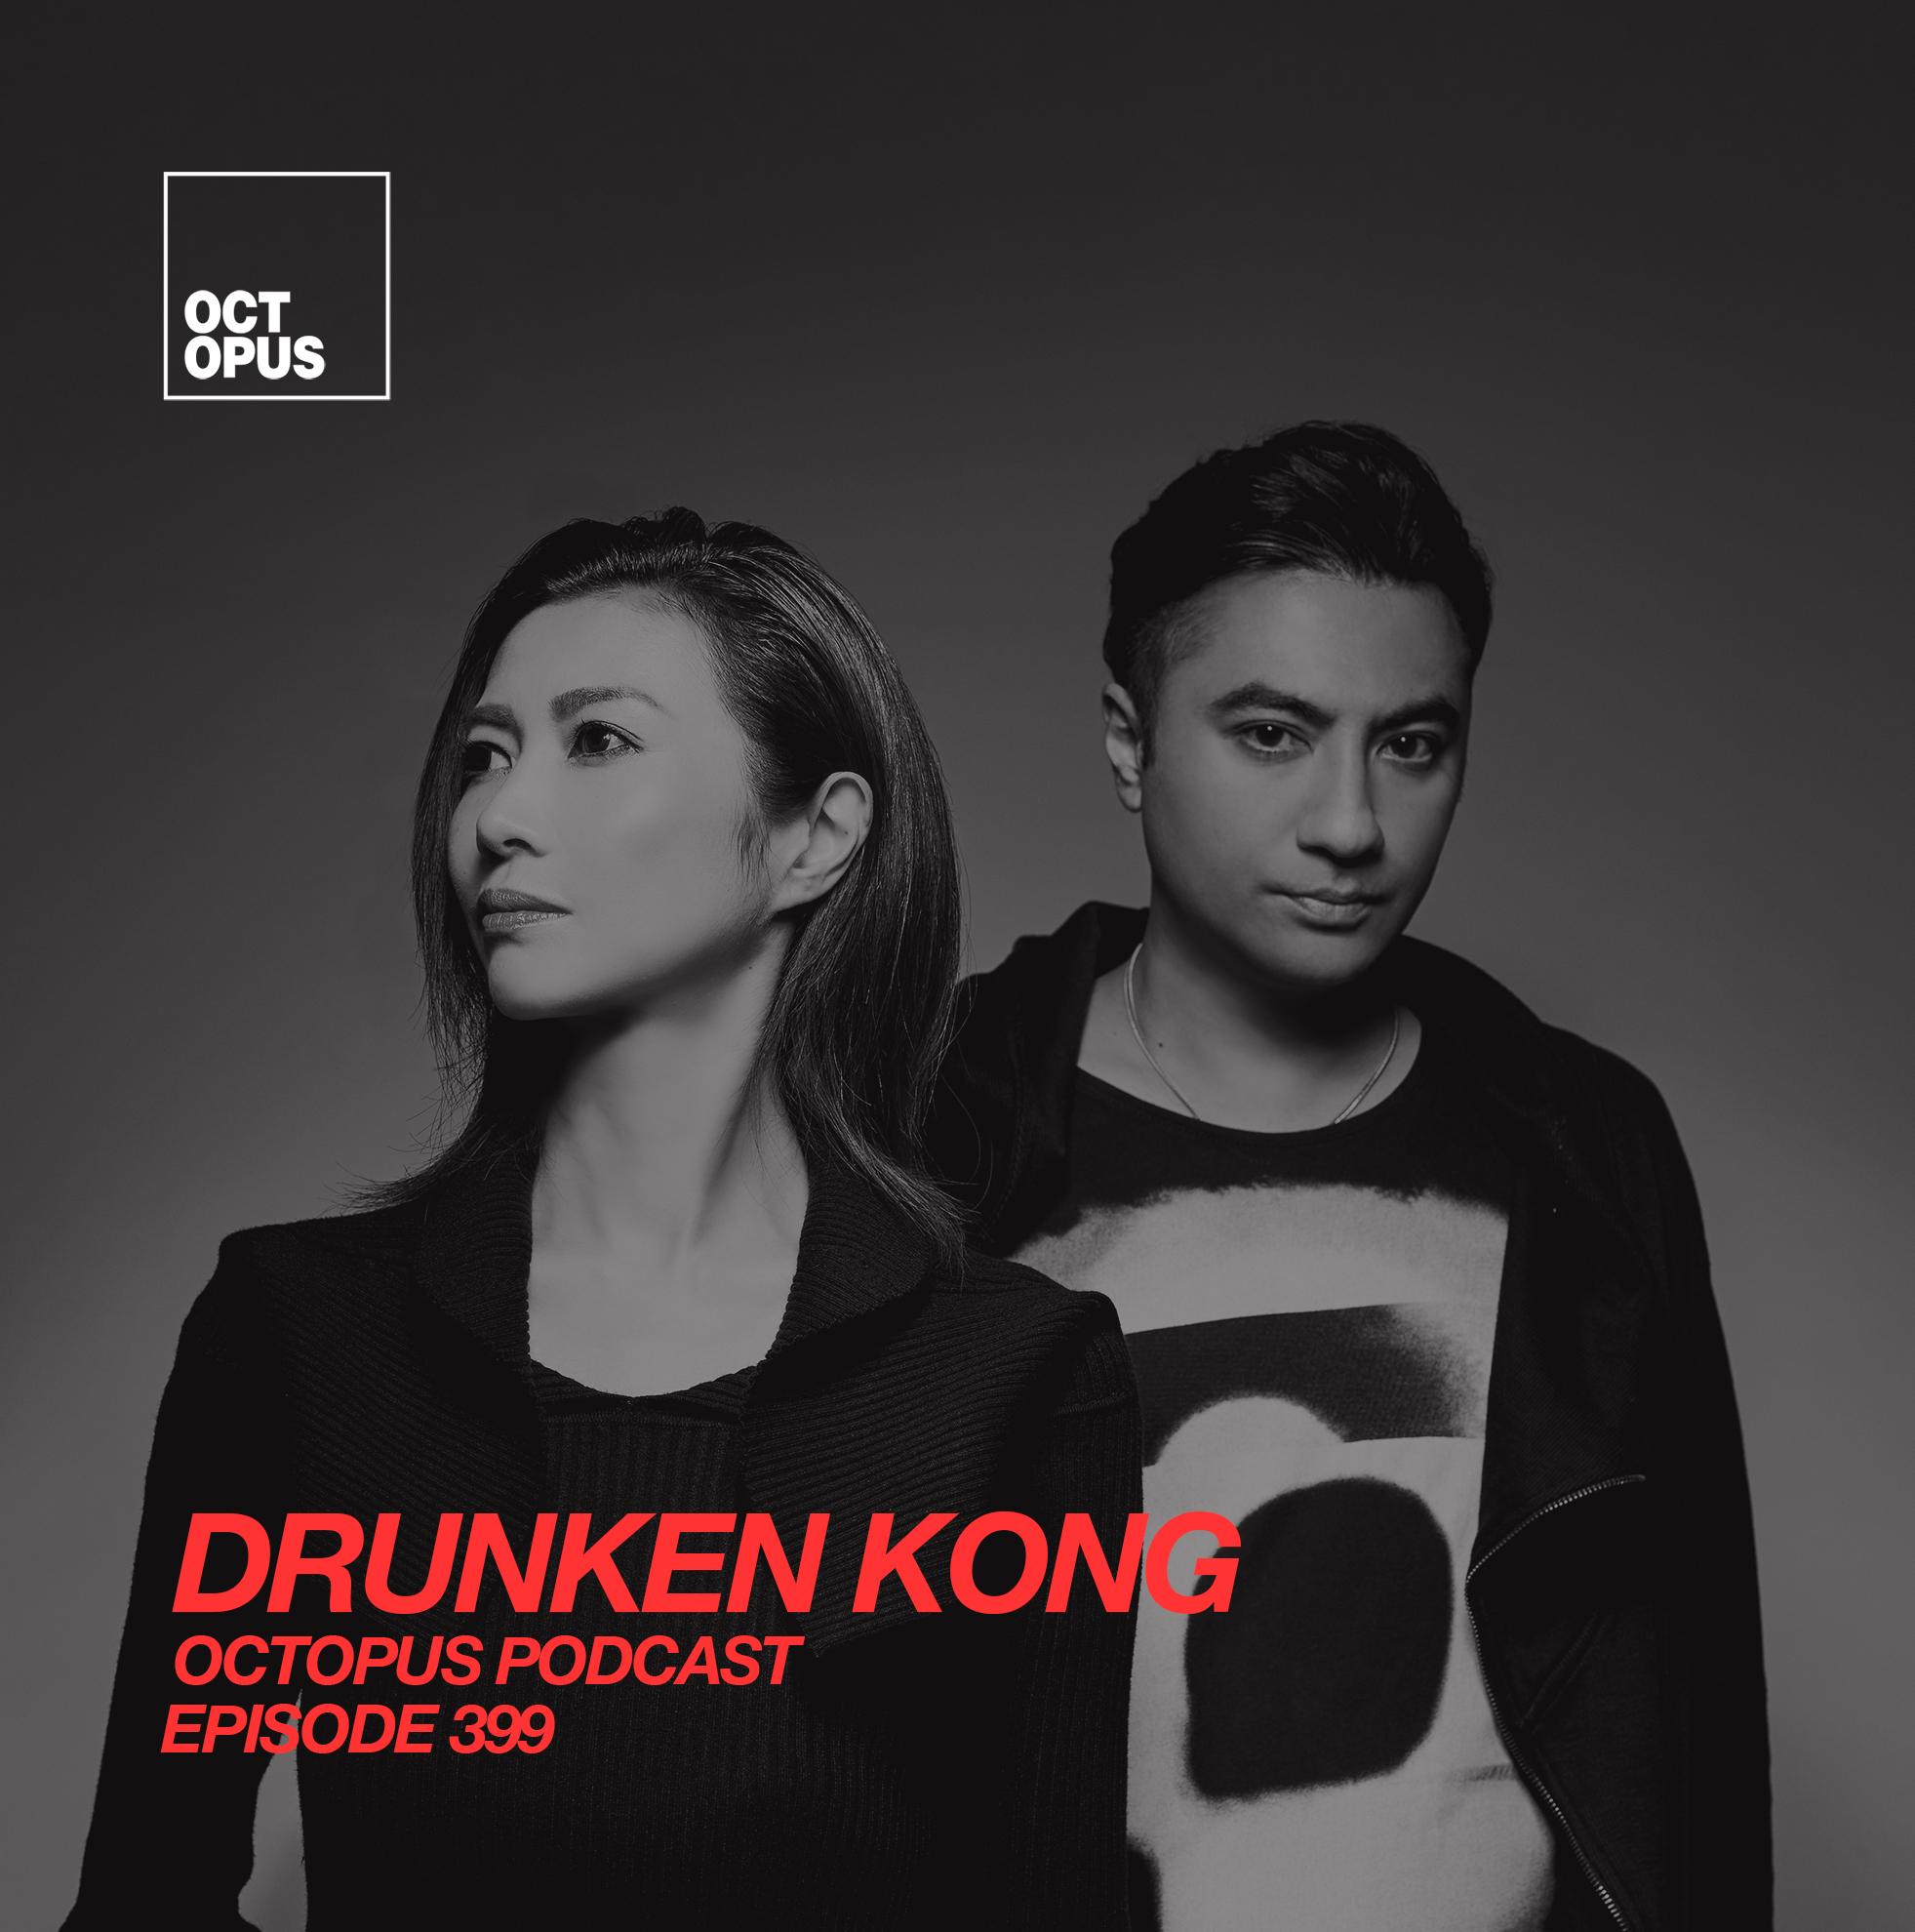 Octopus Podcast 399 - Drunken Kong Image